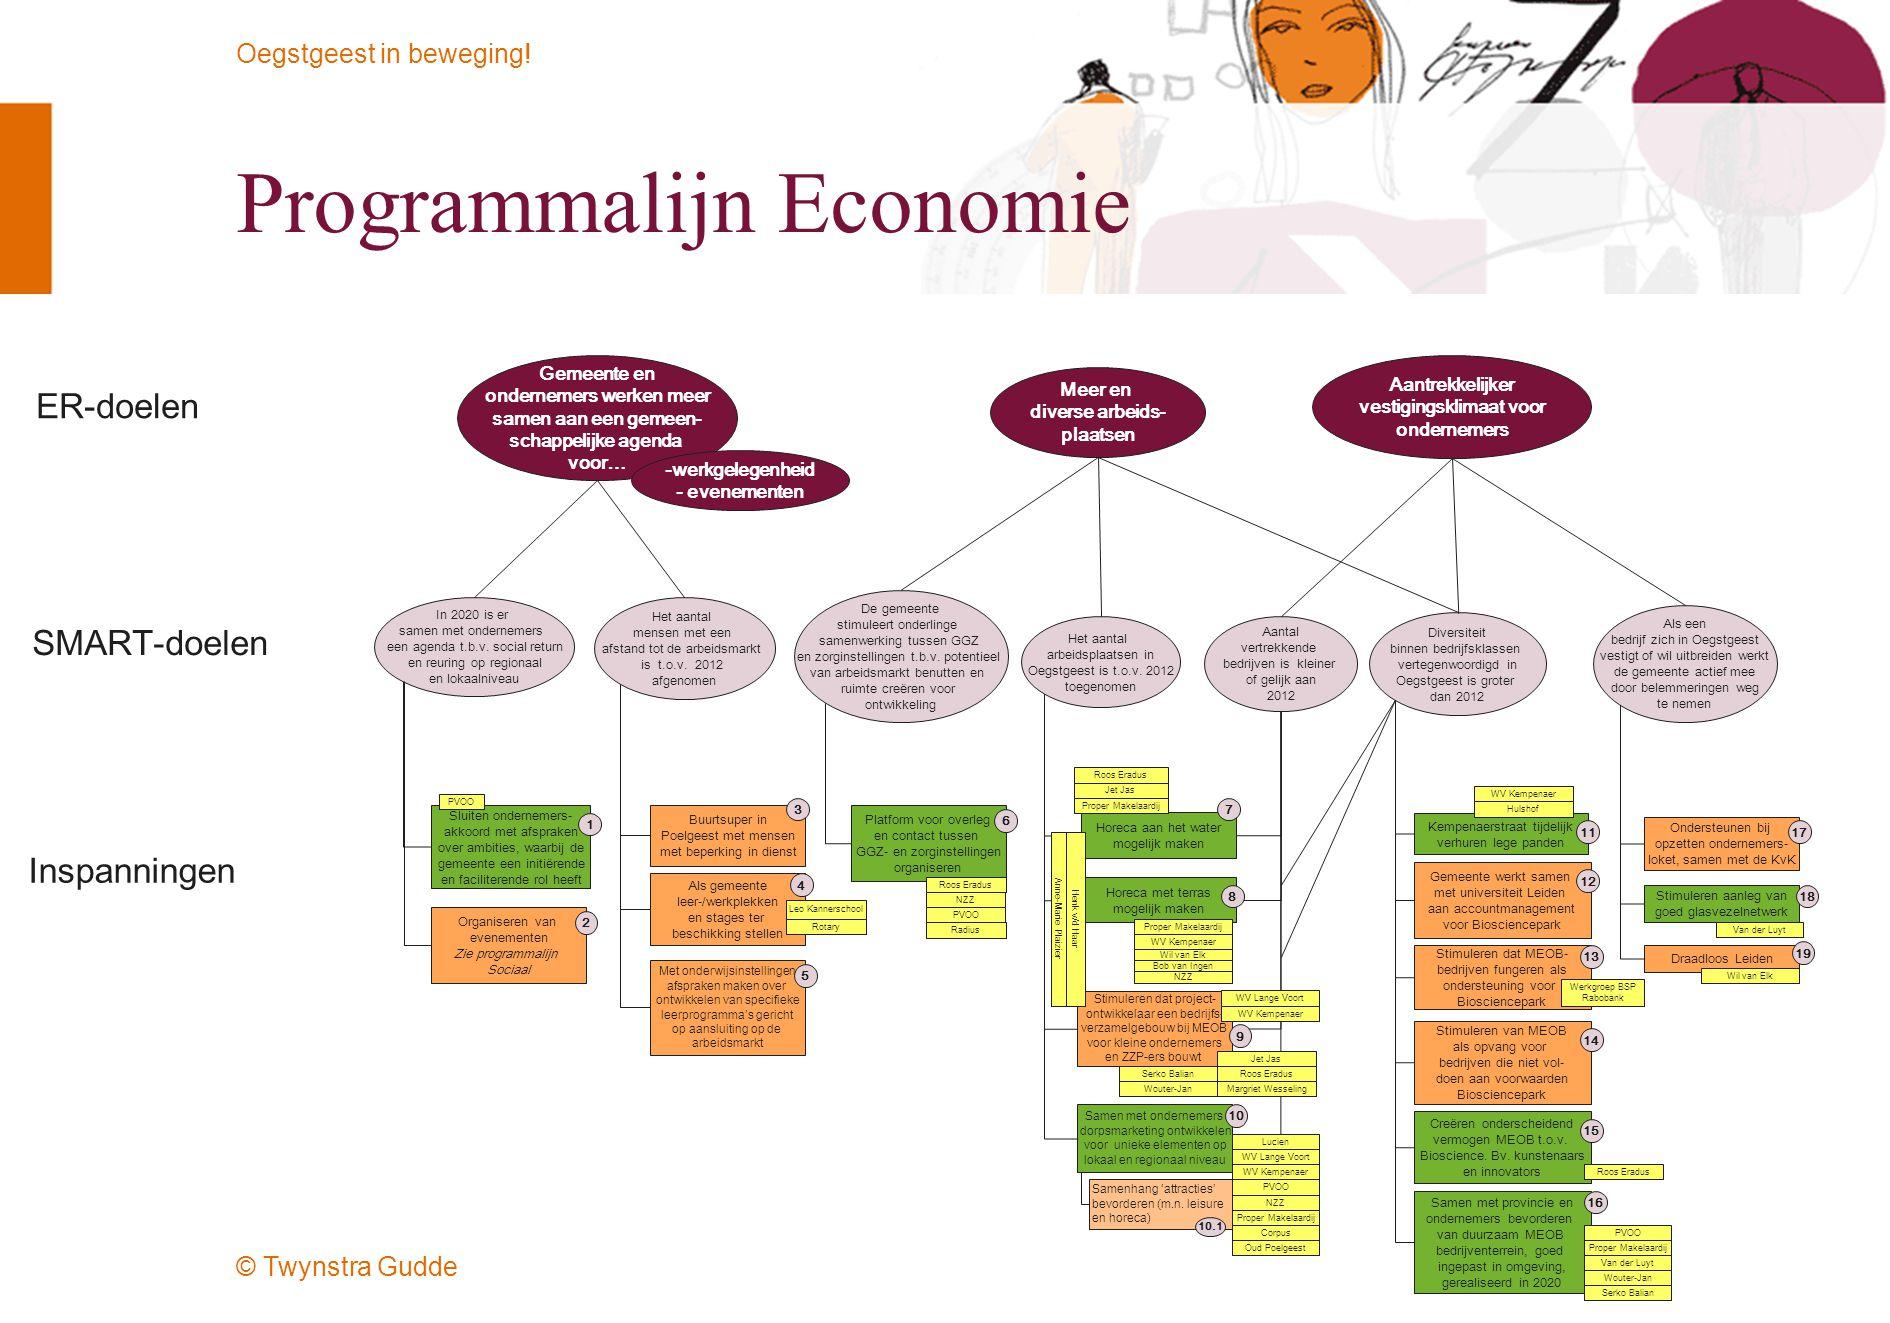 Programmalijn Economie